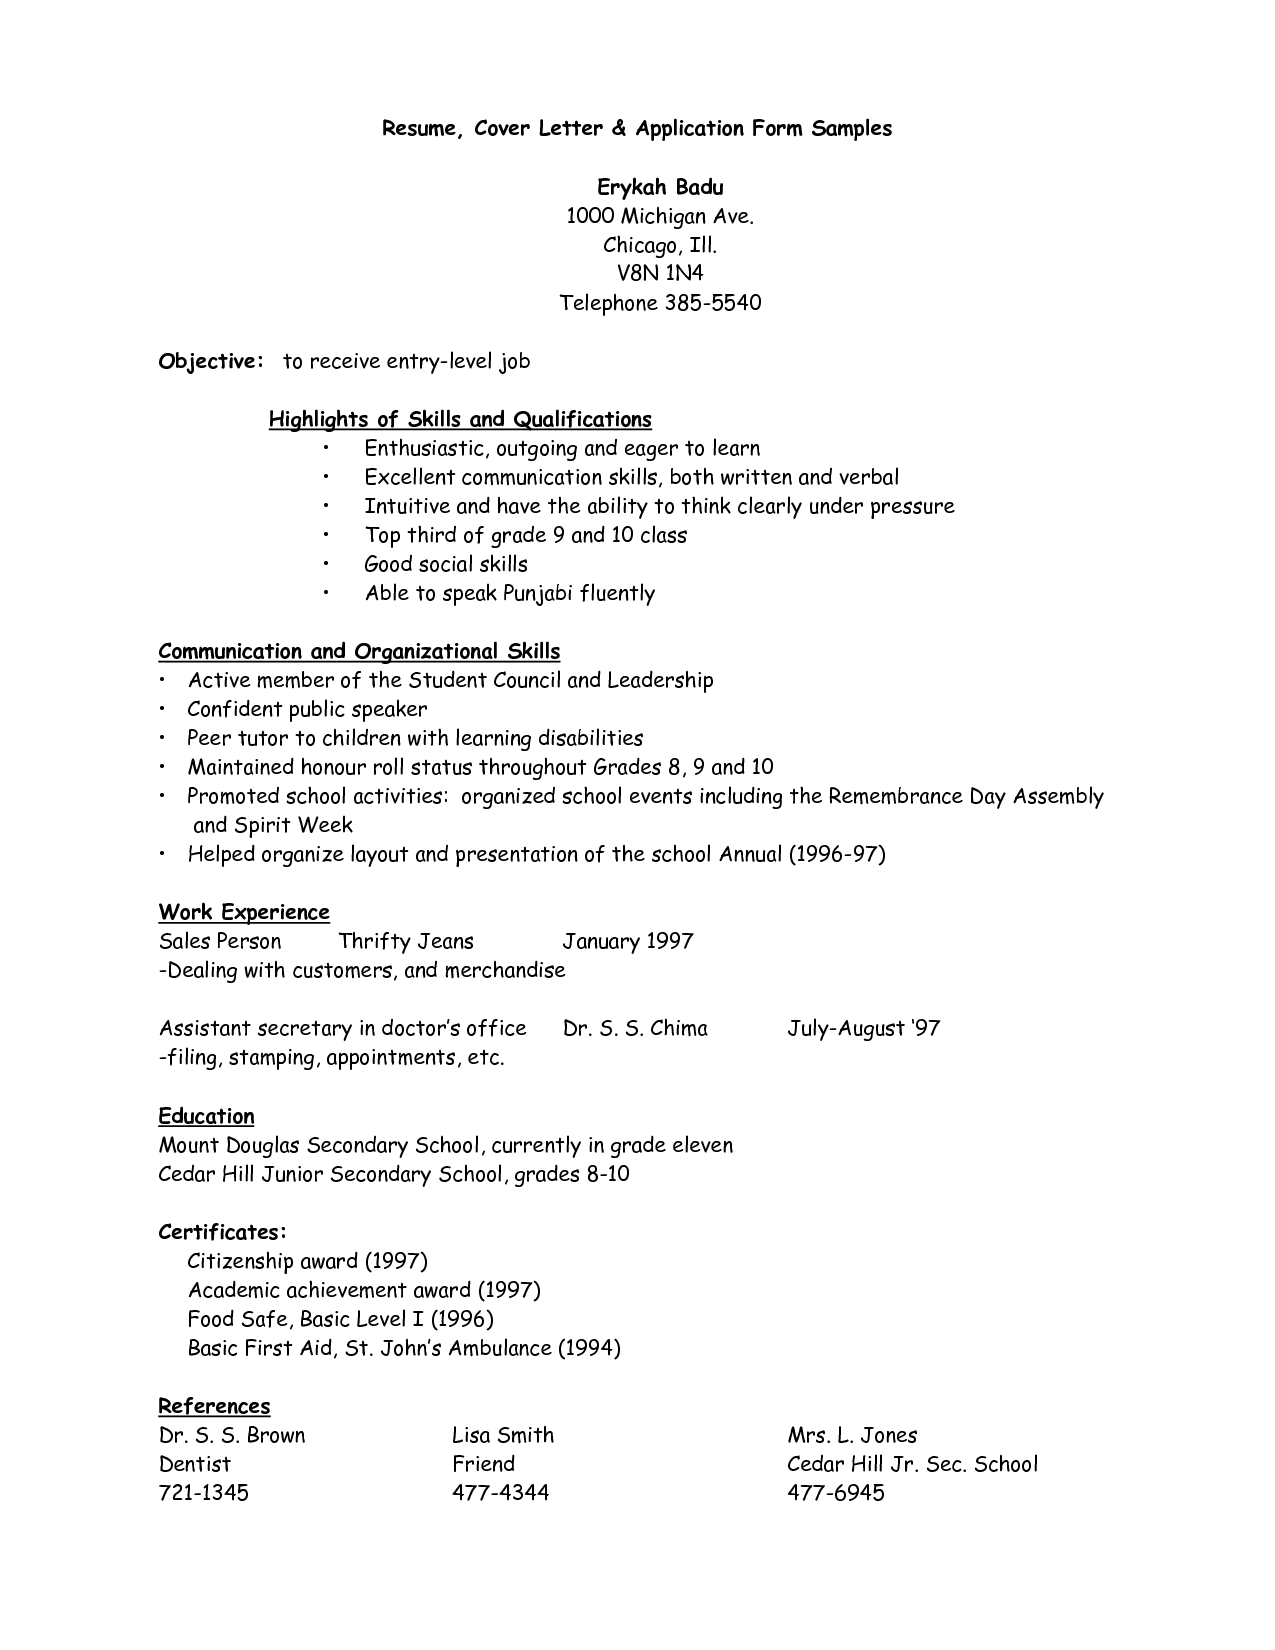 letter for resumes